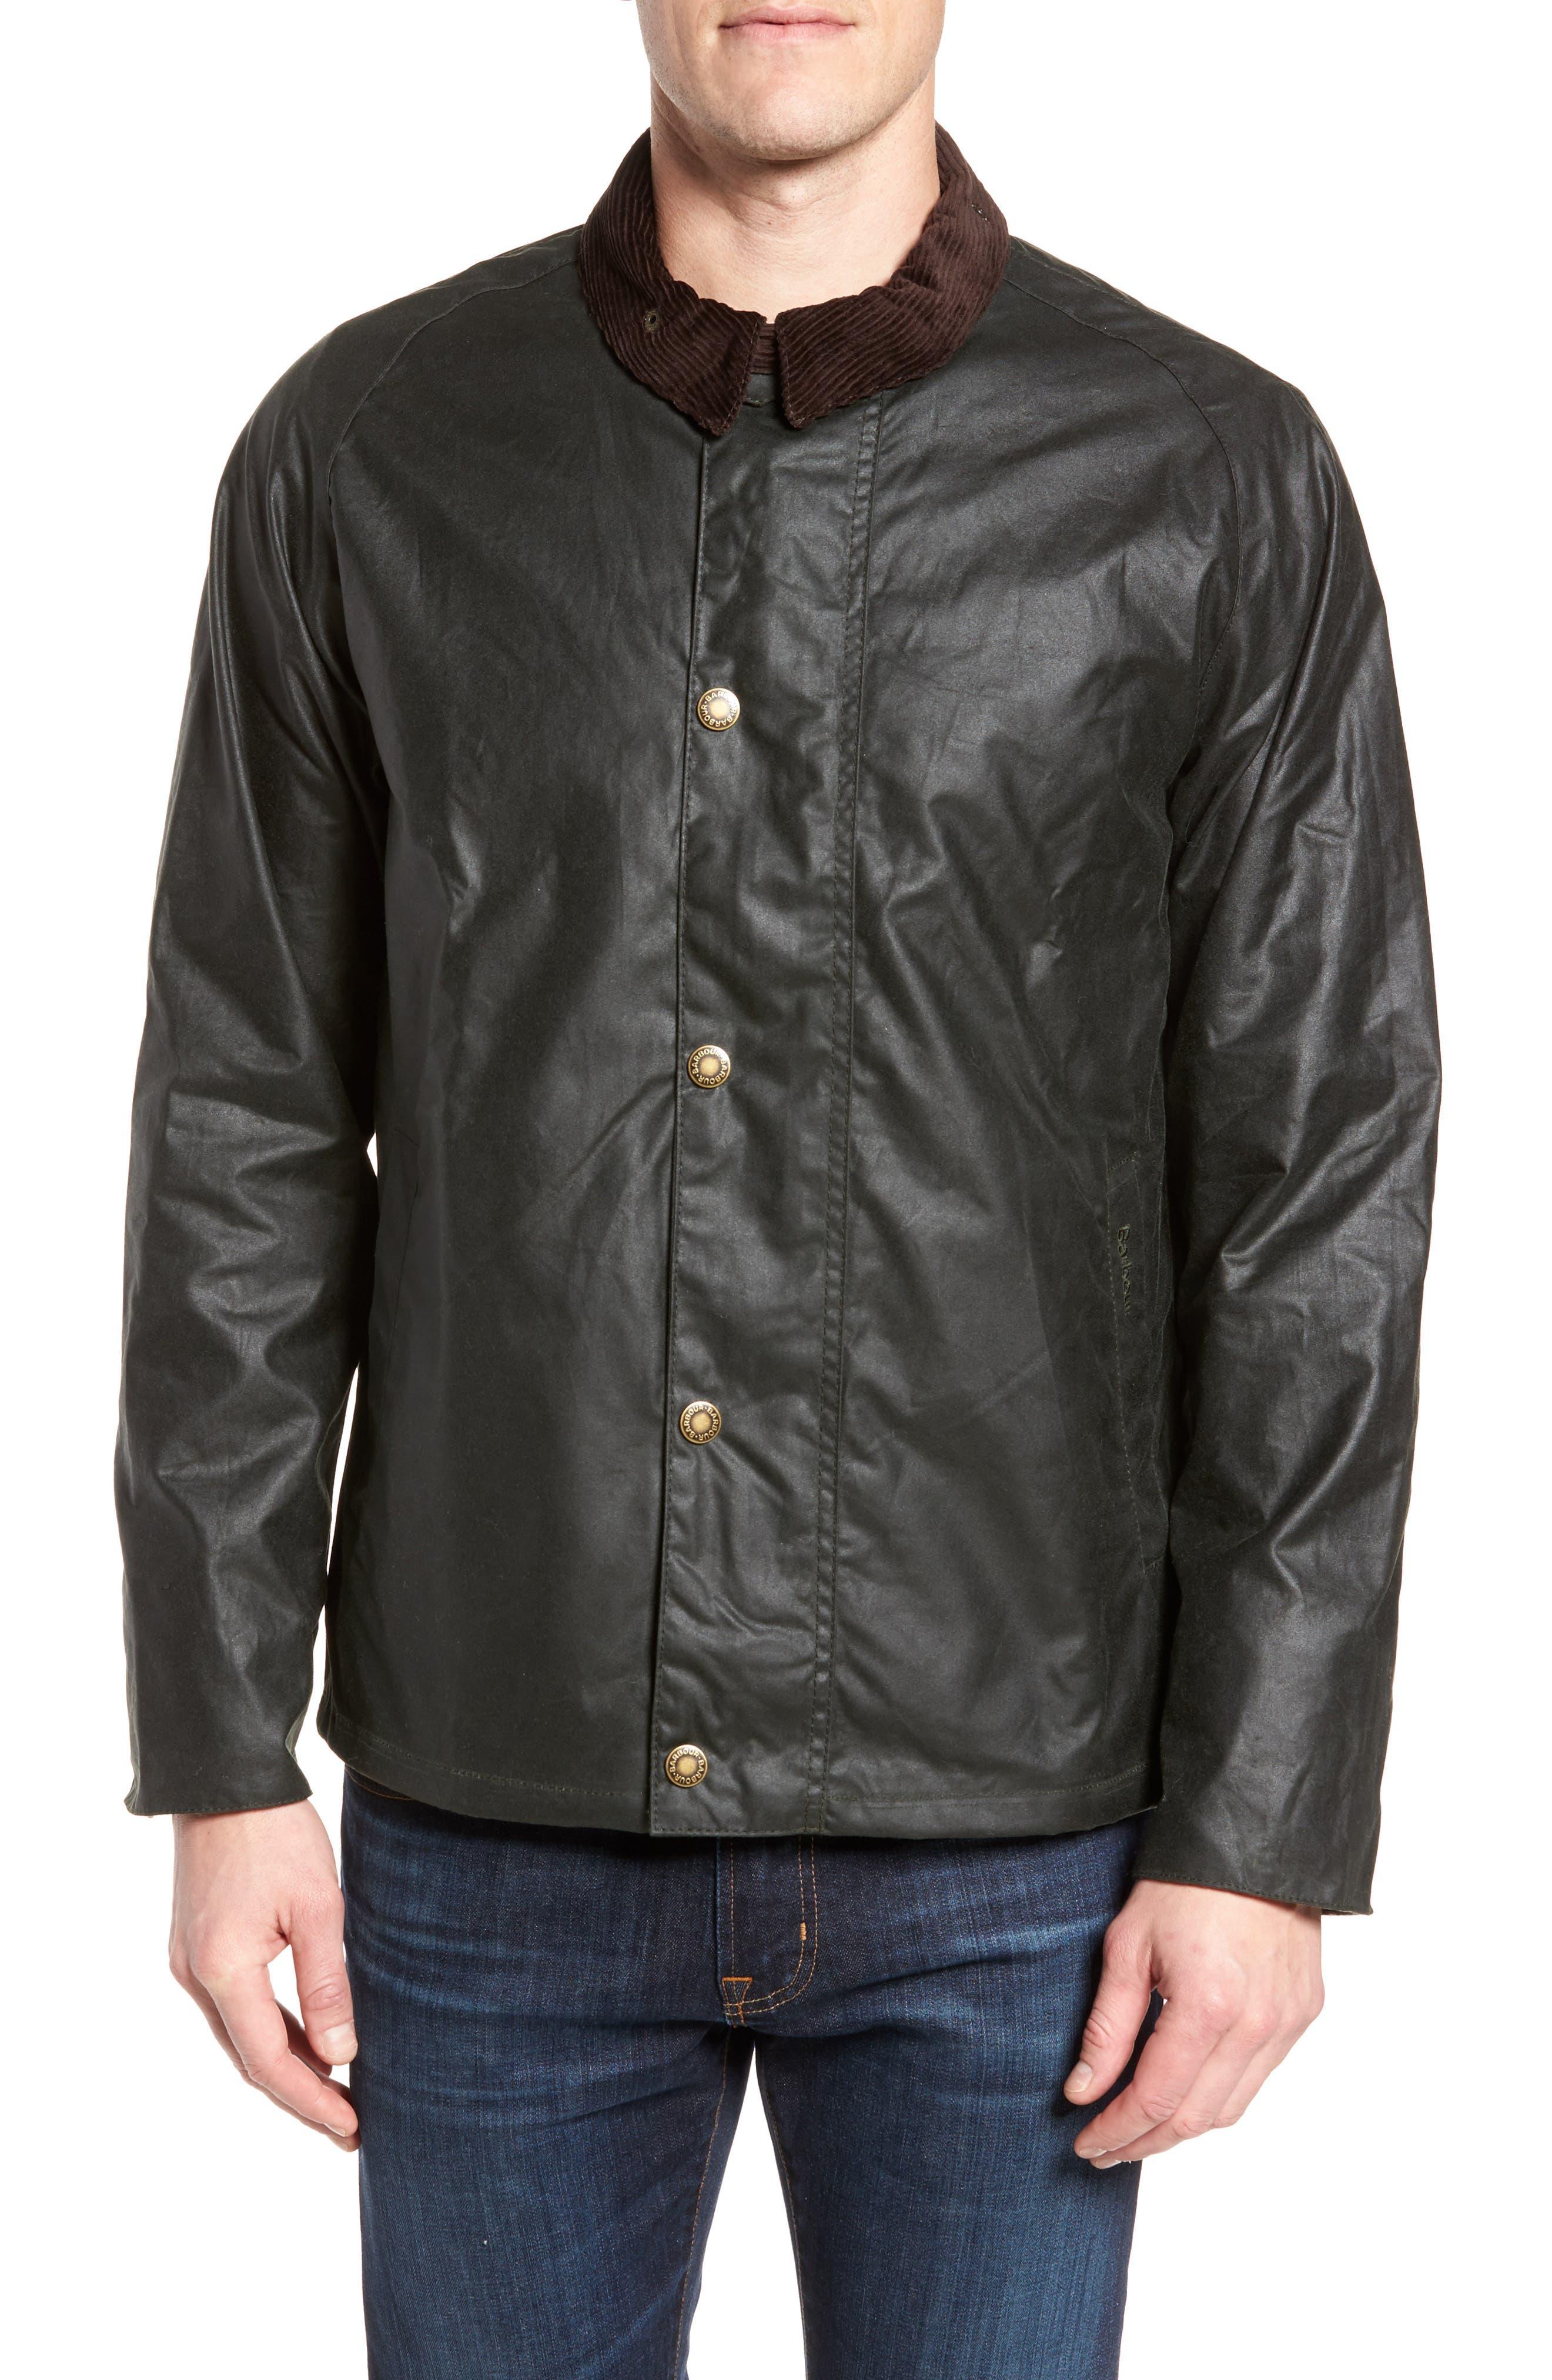 Heskin Waxed Cotton Jacket,                             Alternate thumbnail 4, color,                             Sage